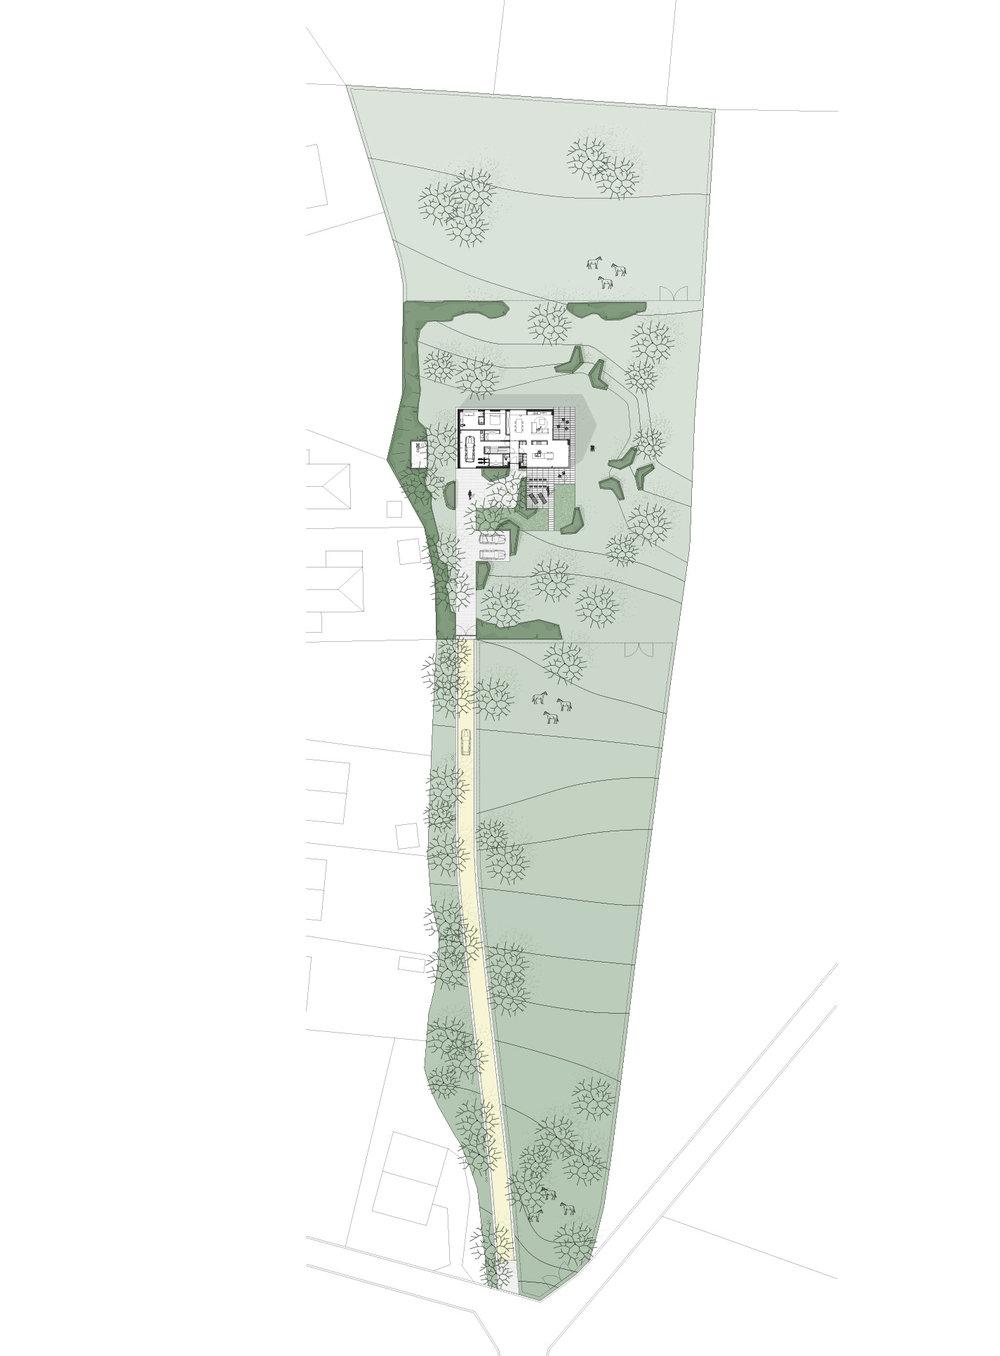 tuinarchitect_floris_steyaert_brussel_paardenweide_snoeivormen_plan